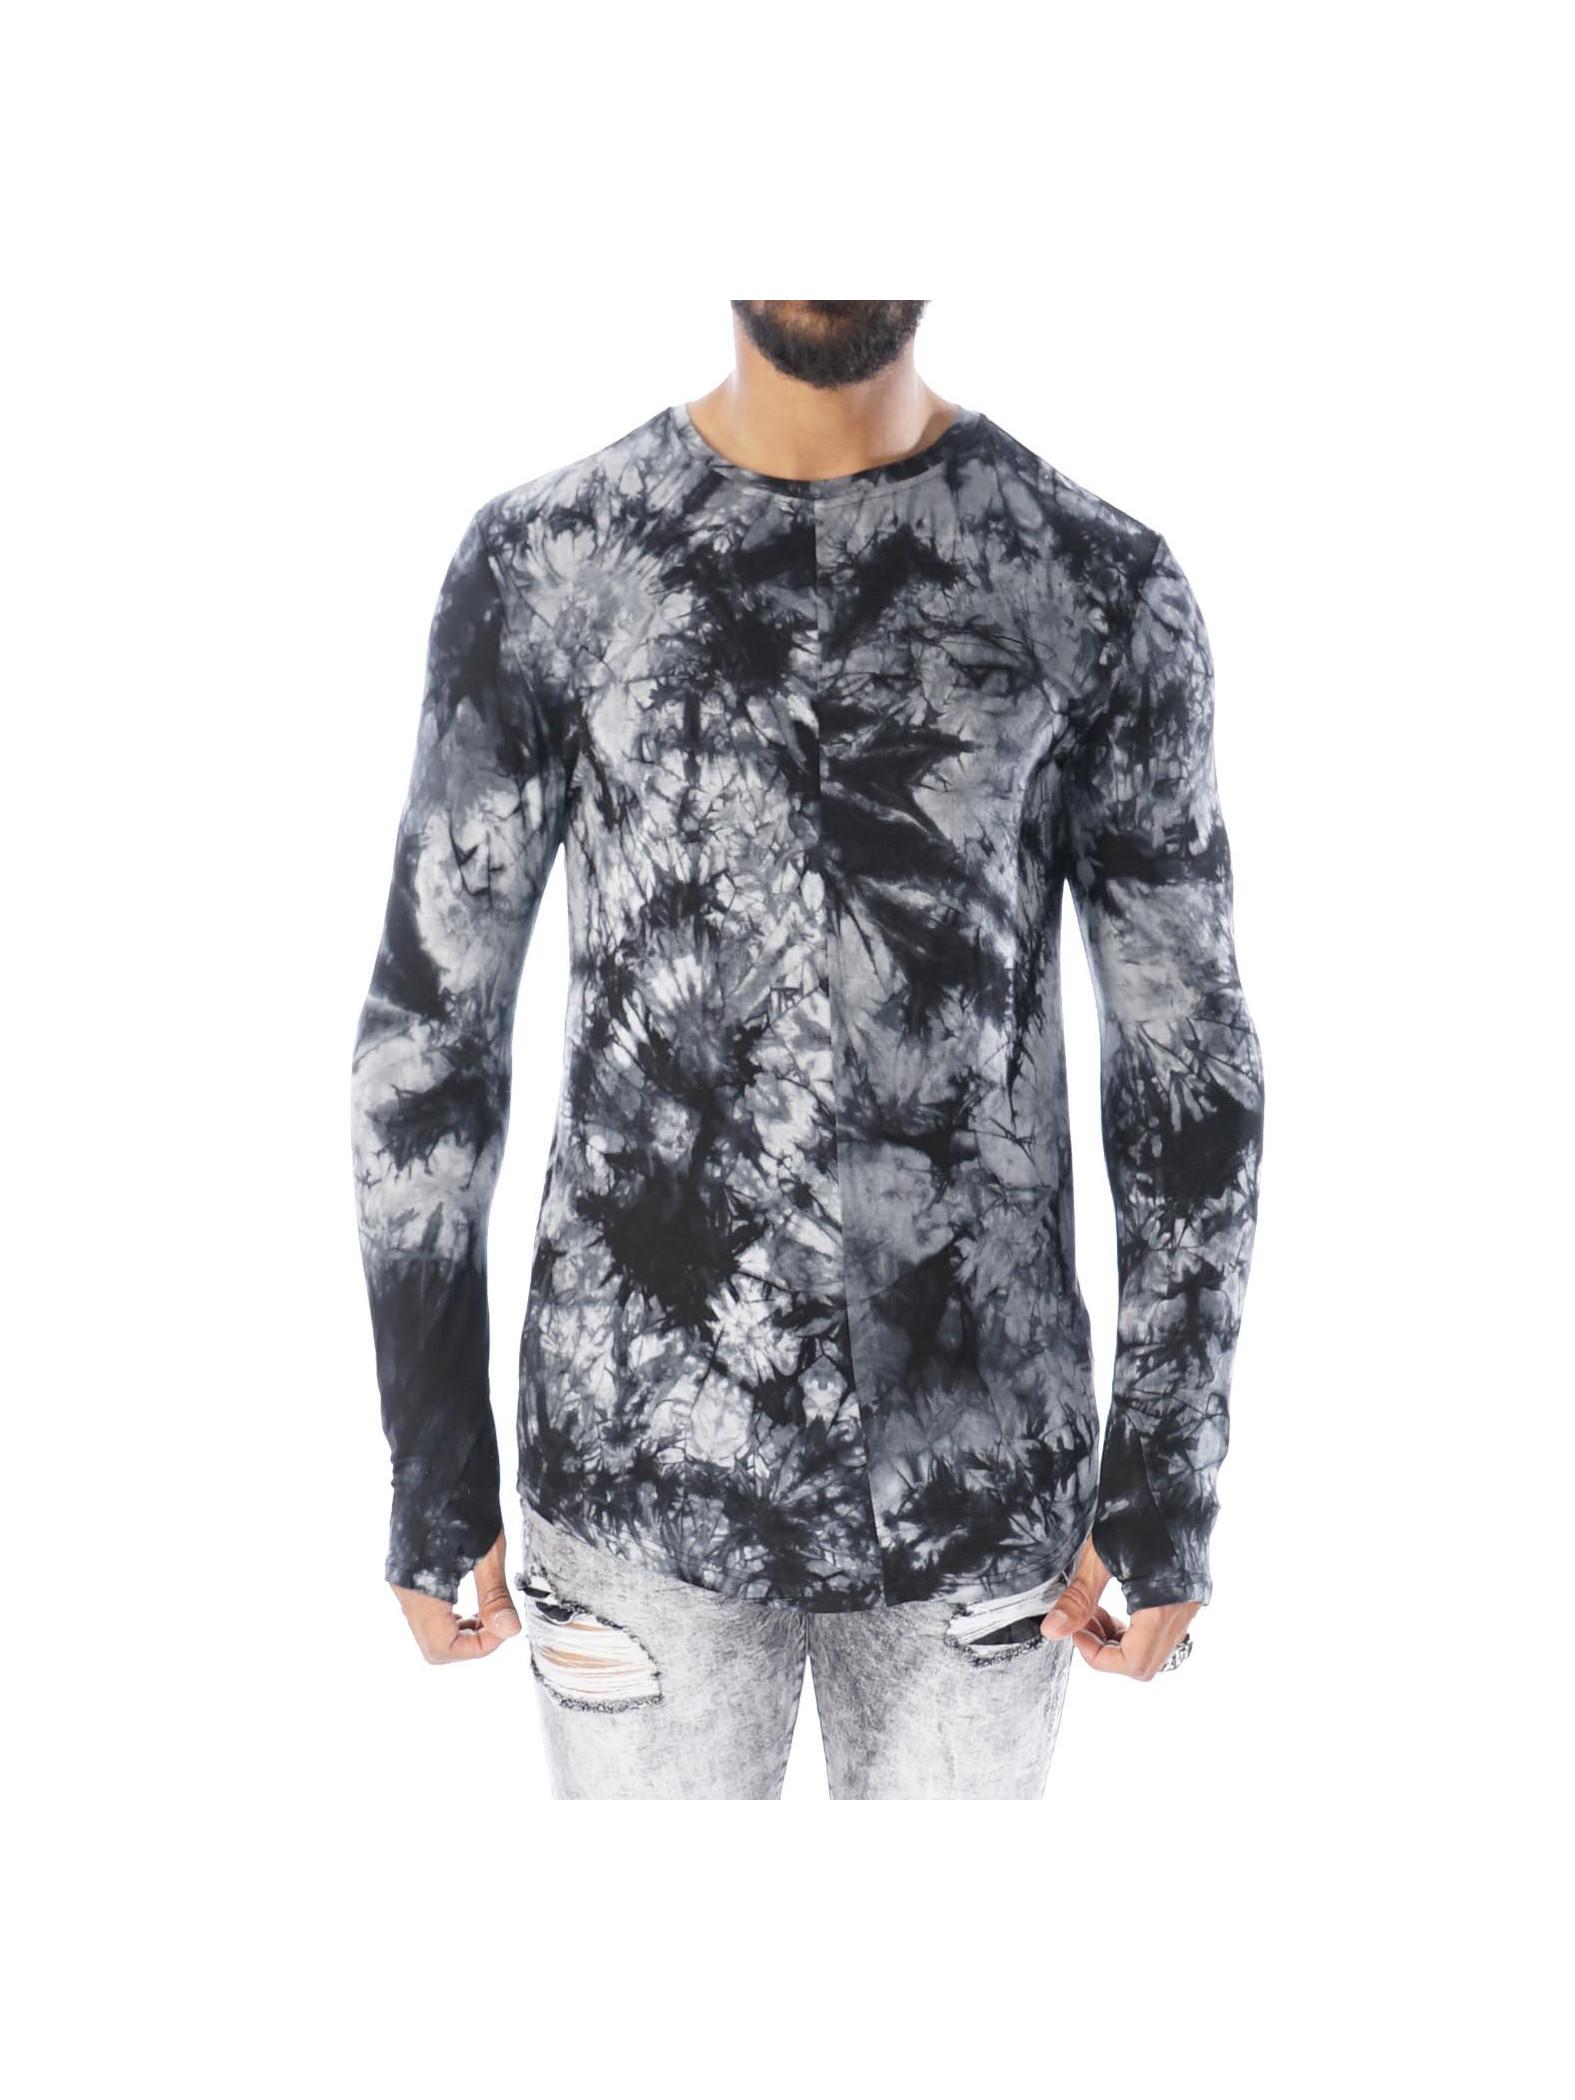 long sleeved dye tie tee shirt homme project x paris 88162232. Black Bedroom Furniture Sets. Home Design Ideas